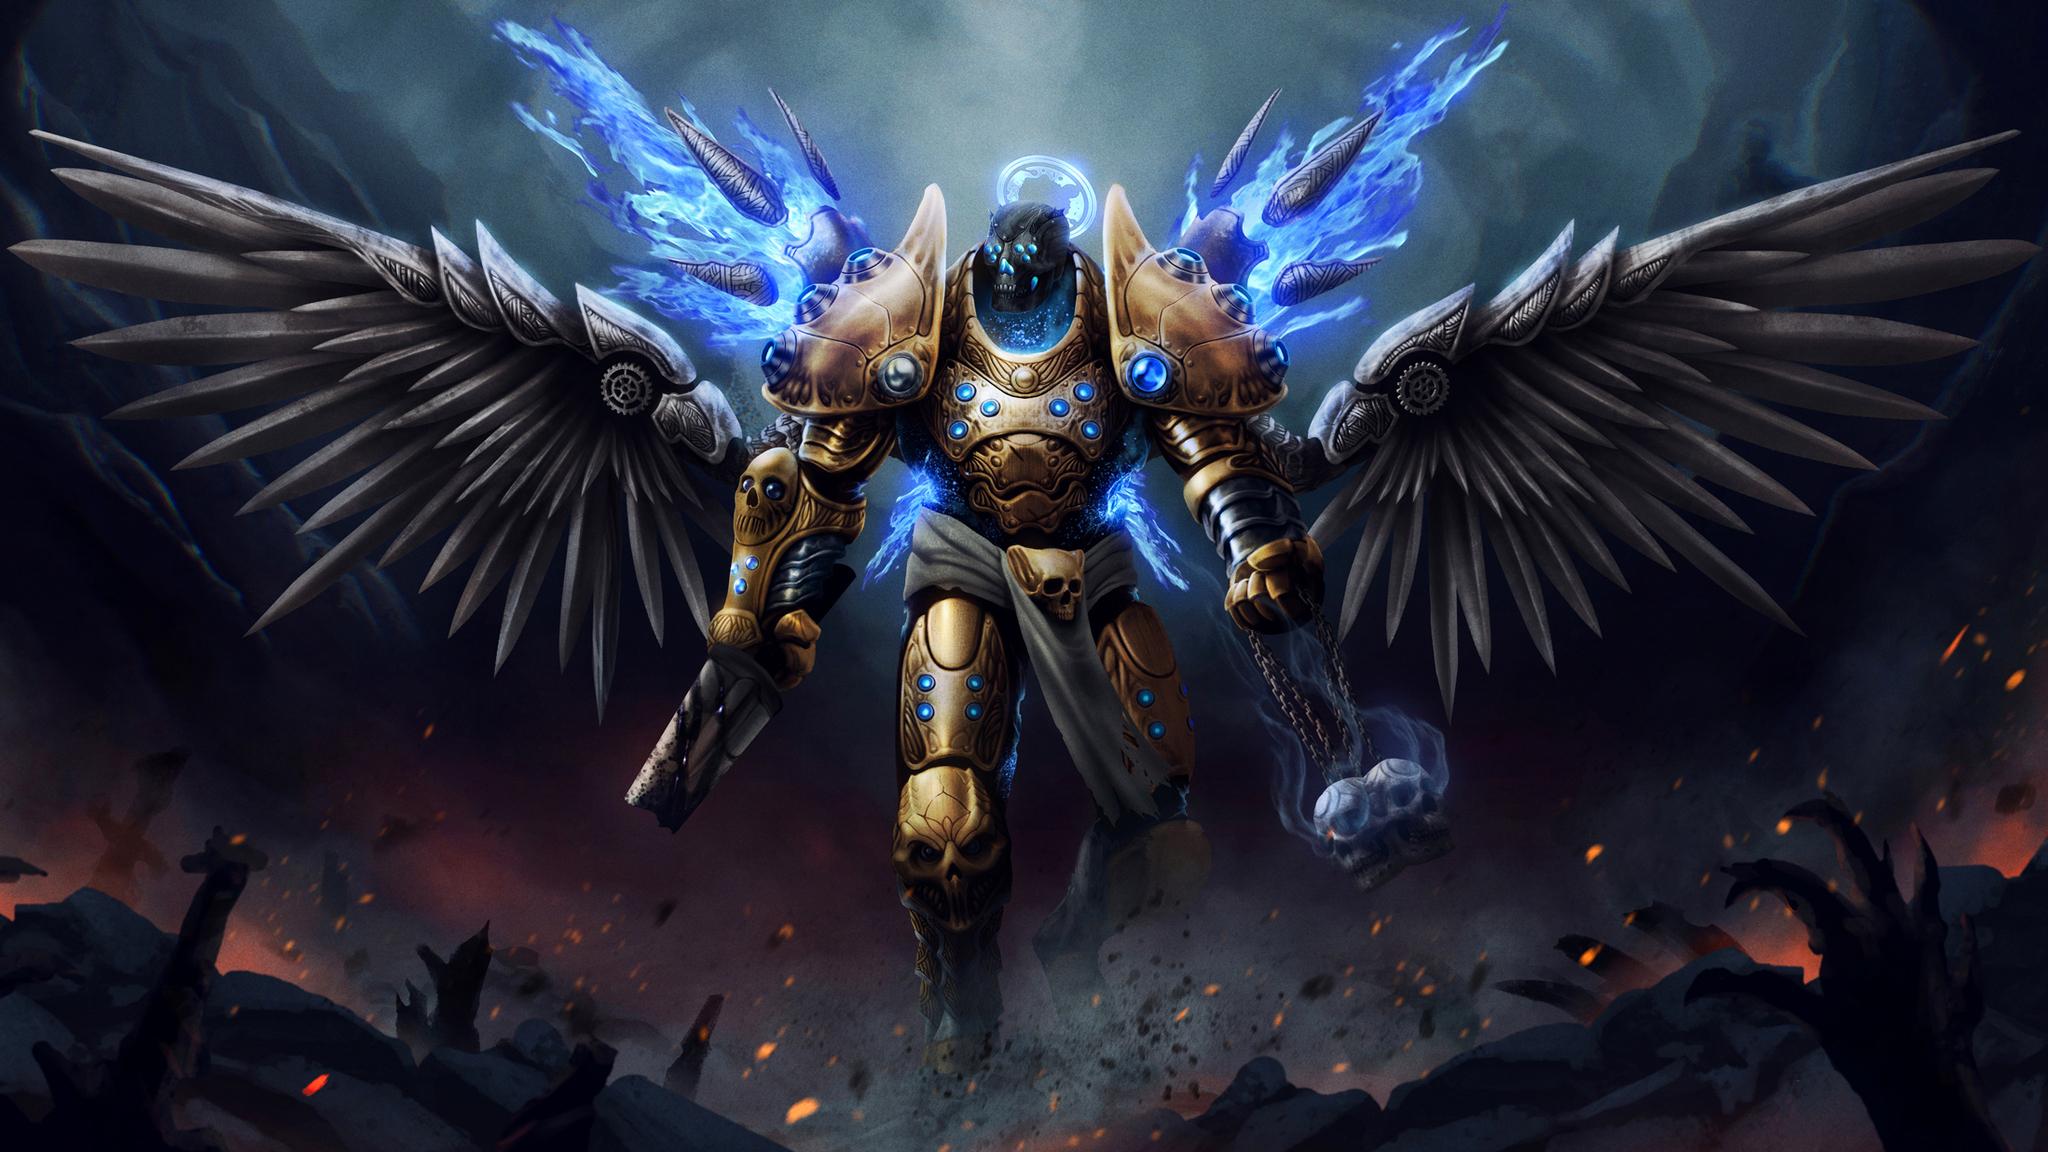 2048x1152 angel warrior 2048x1152 resolution hd 4k wallpapers